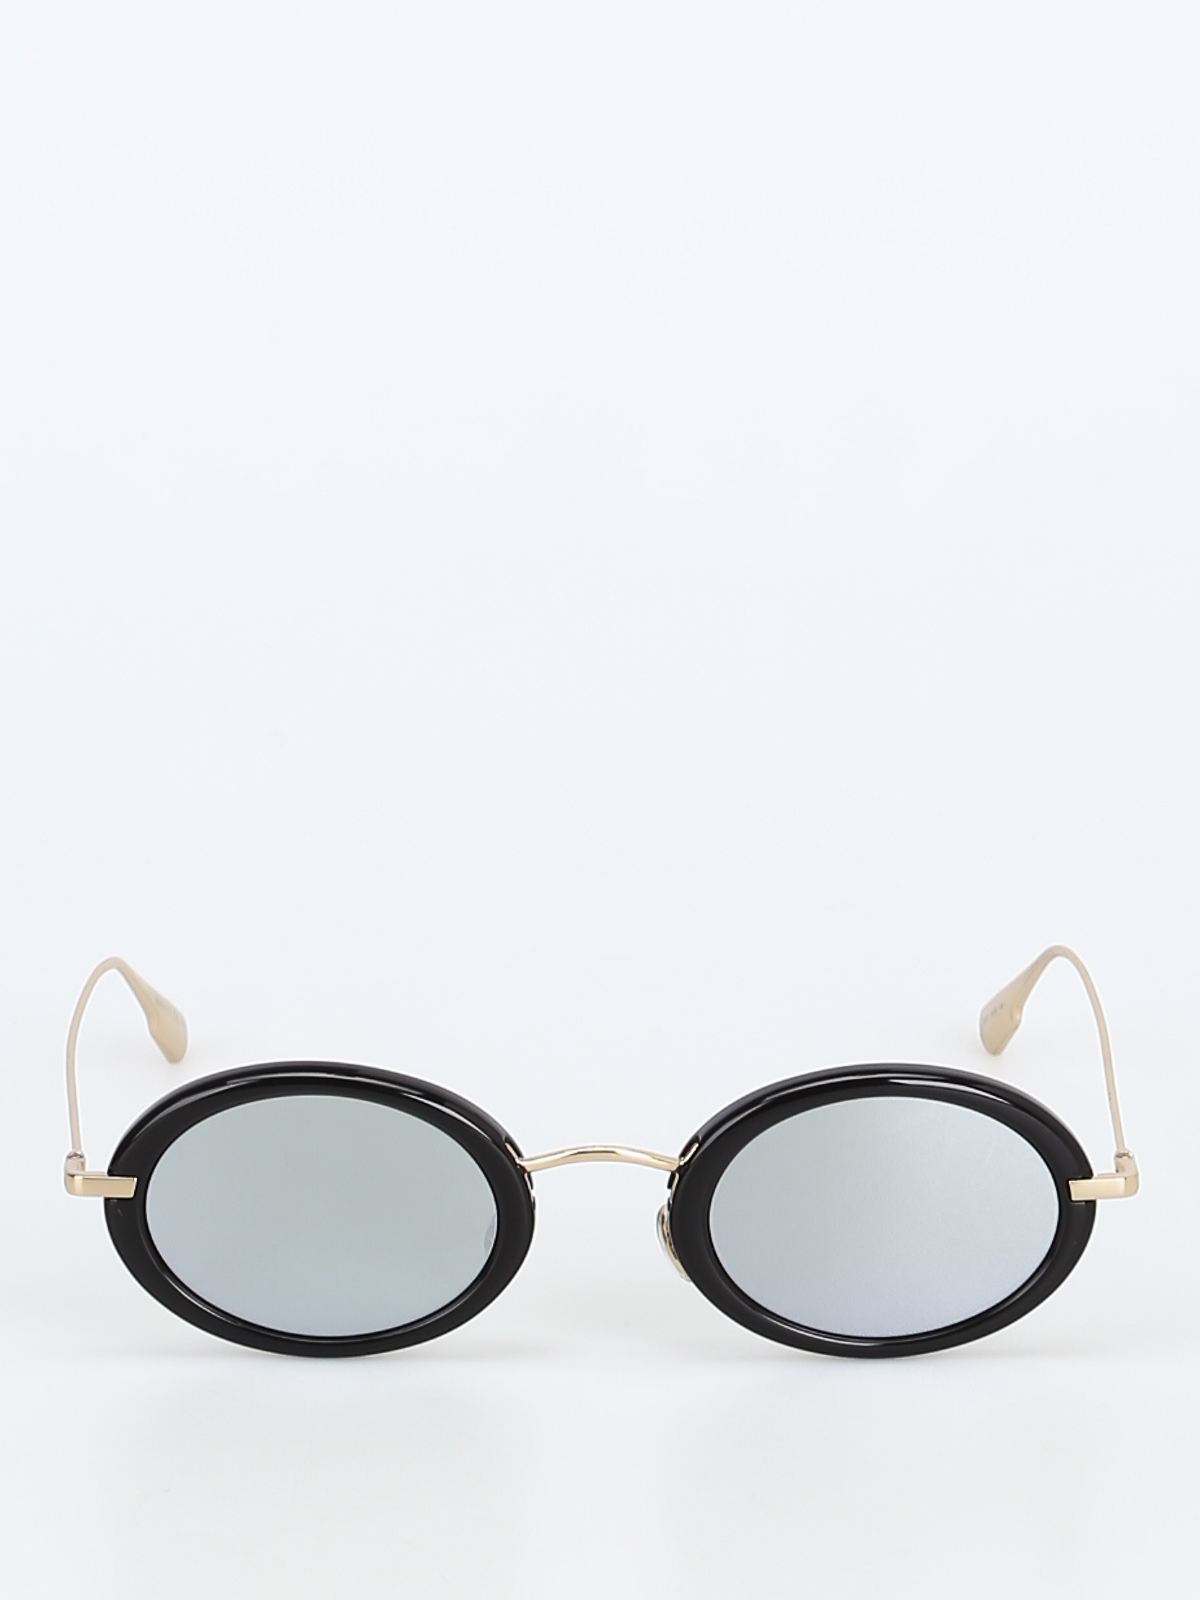 b3cf68cd3e7 Dior - Hypnotic mirrored sunglasses - sunglasses - DIORHYPNOTIC22M20T